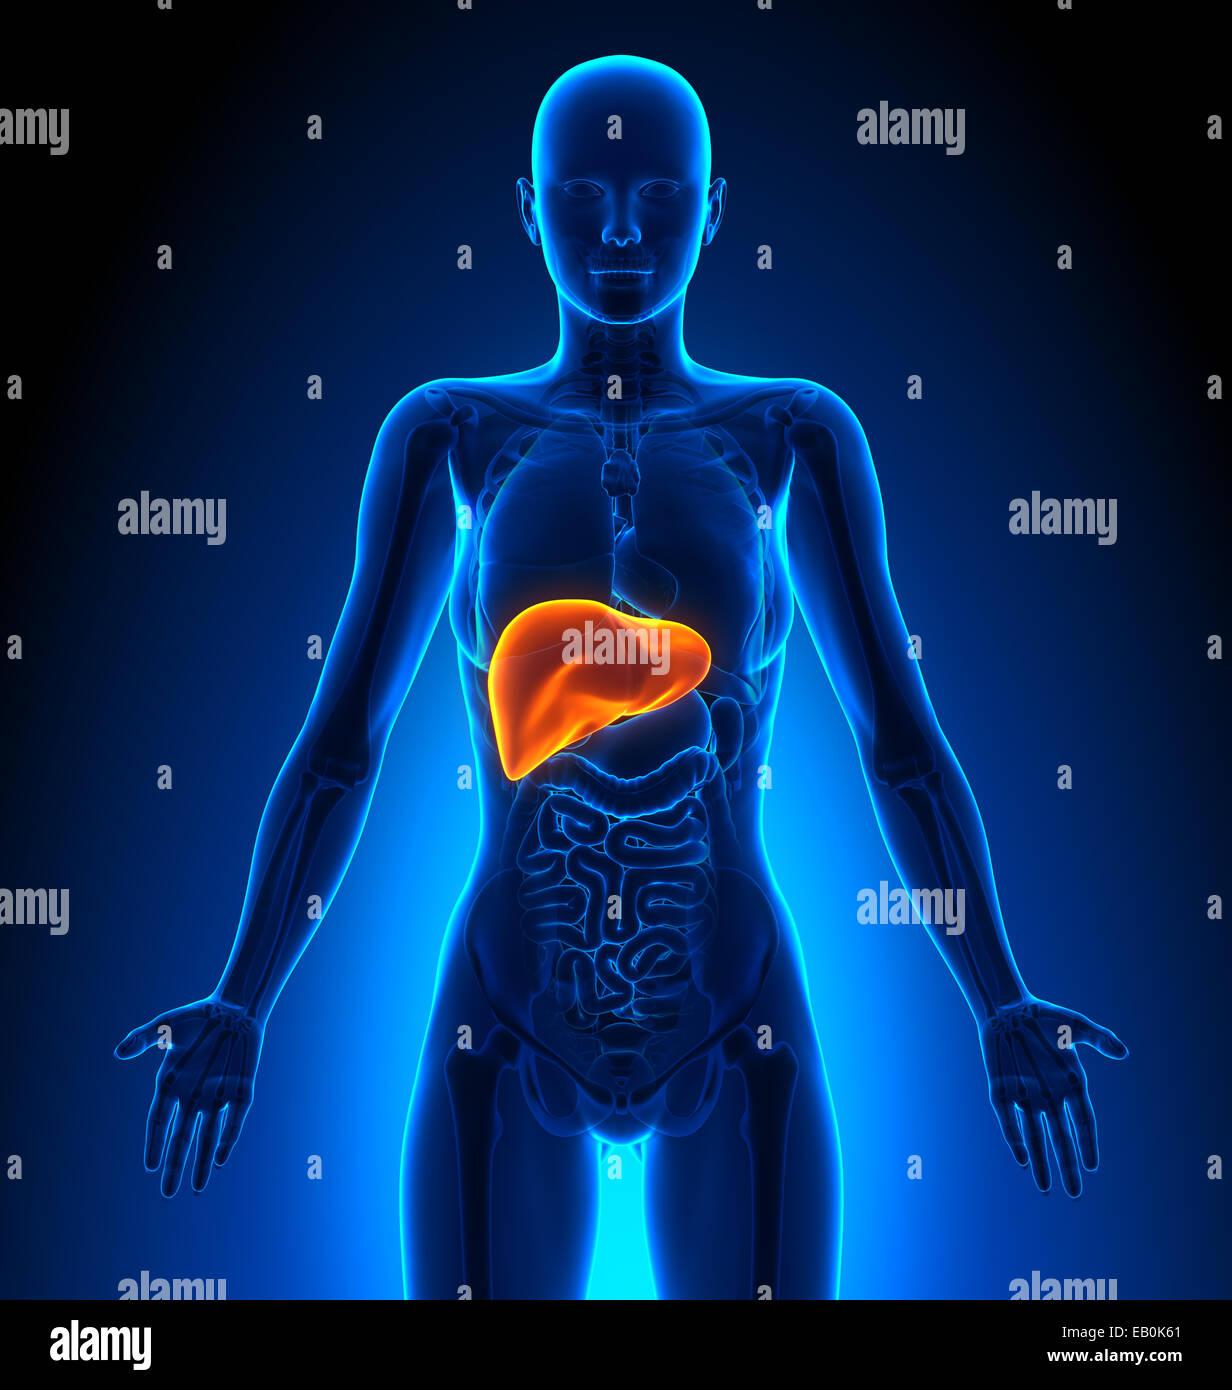 Hígado: órganos femeninos - Anatomía Humana Foto & Imagen De Stock ...